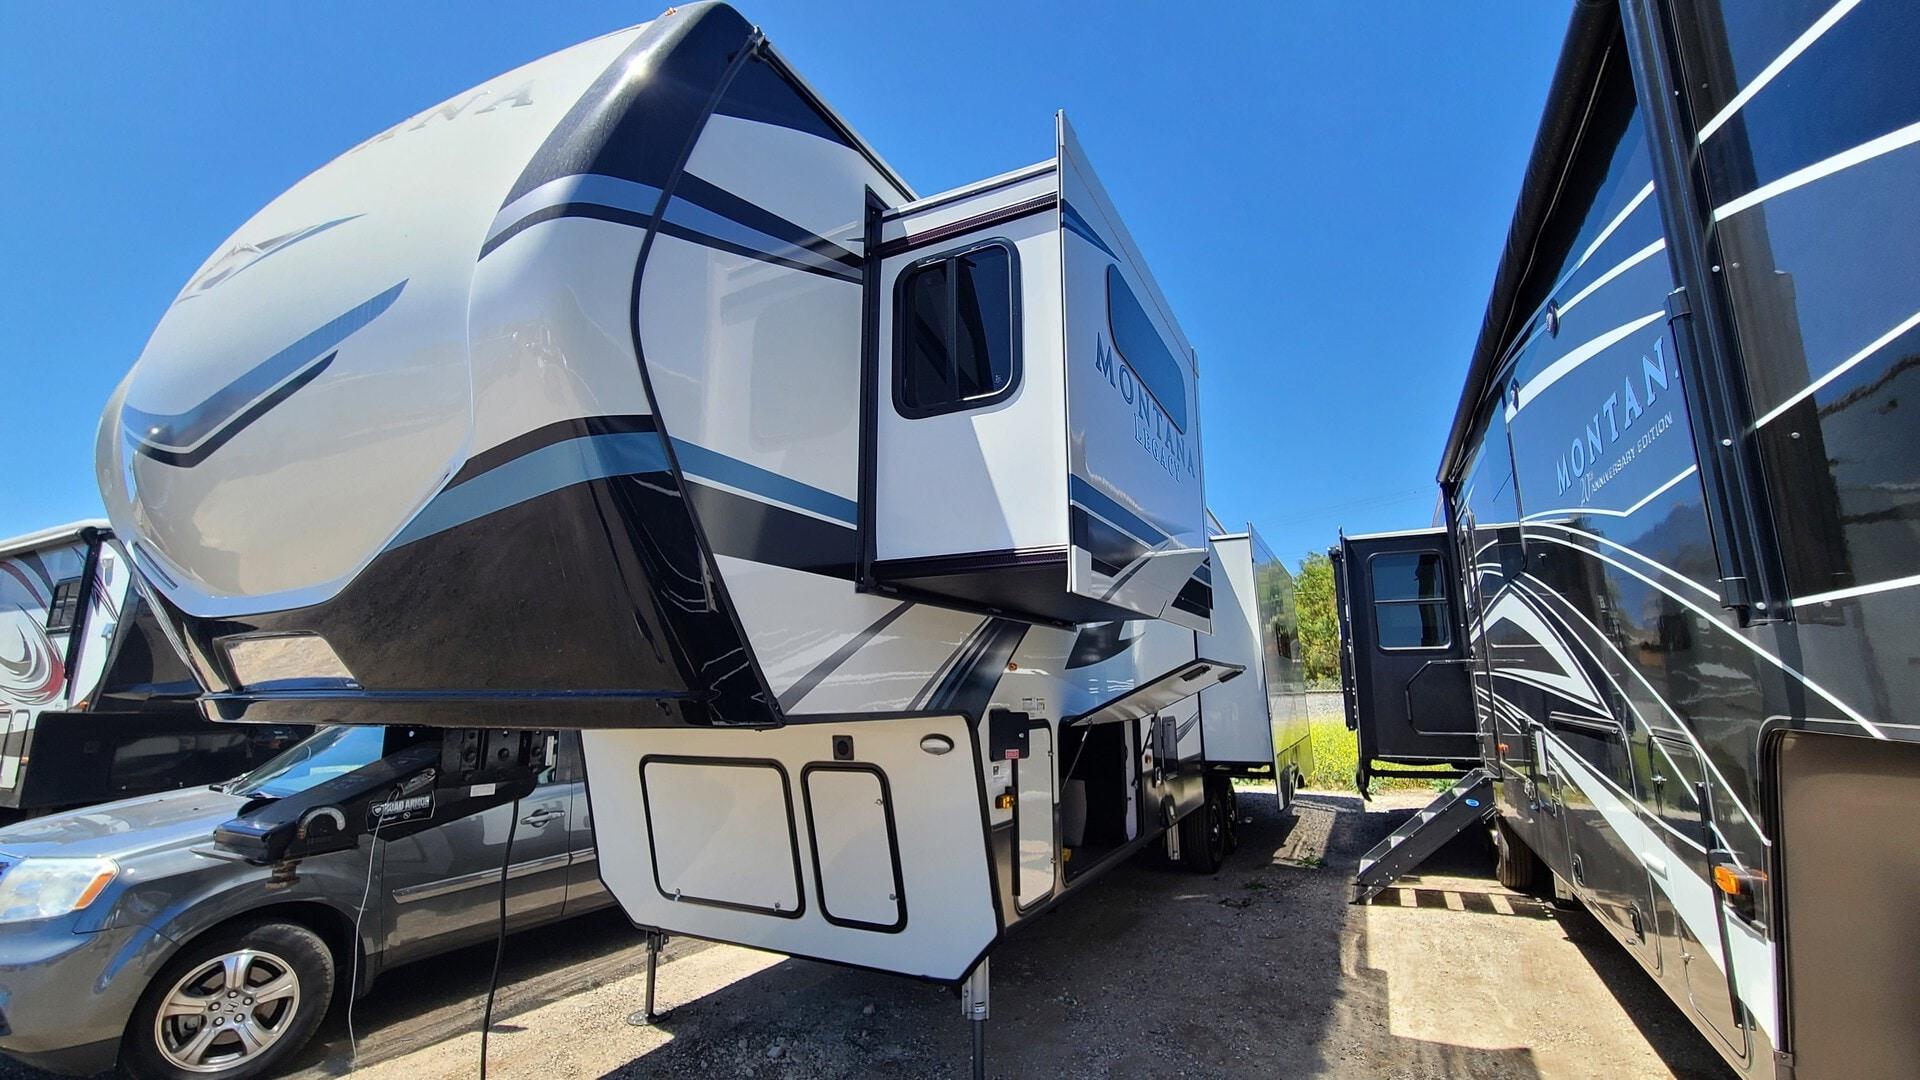 Used, 2021, Montana, 3231CK, Fifth Wheels